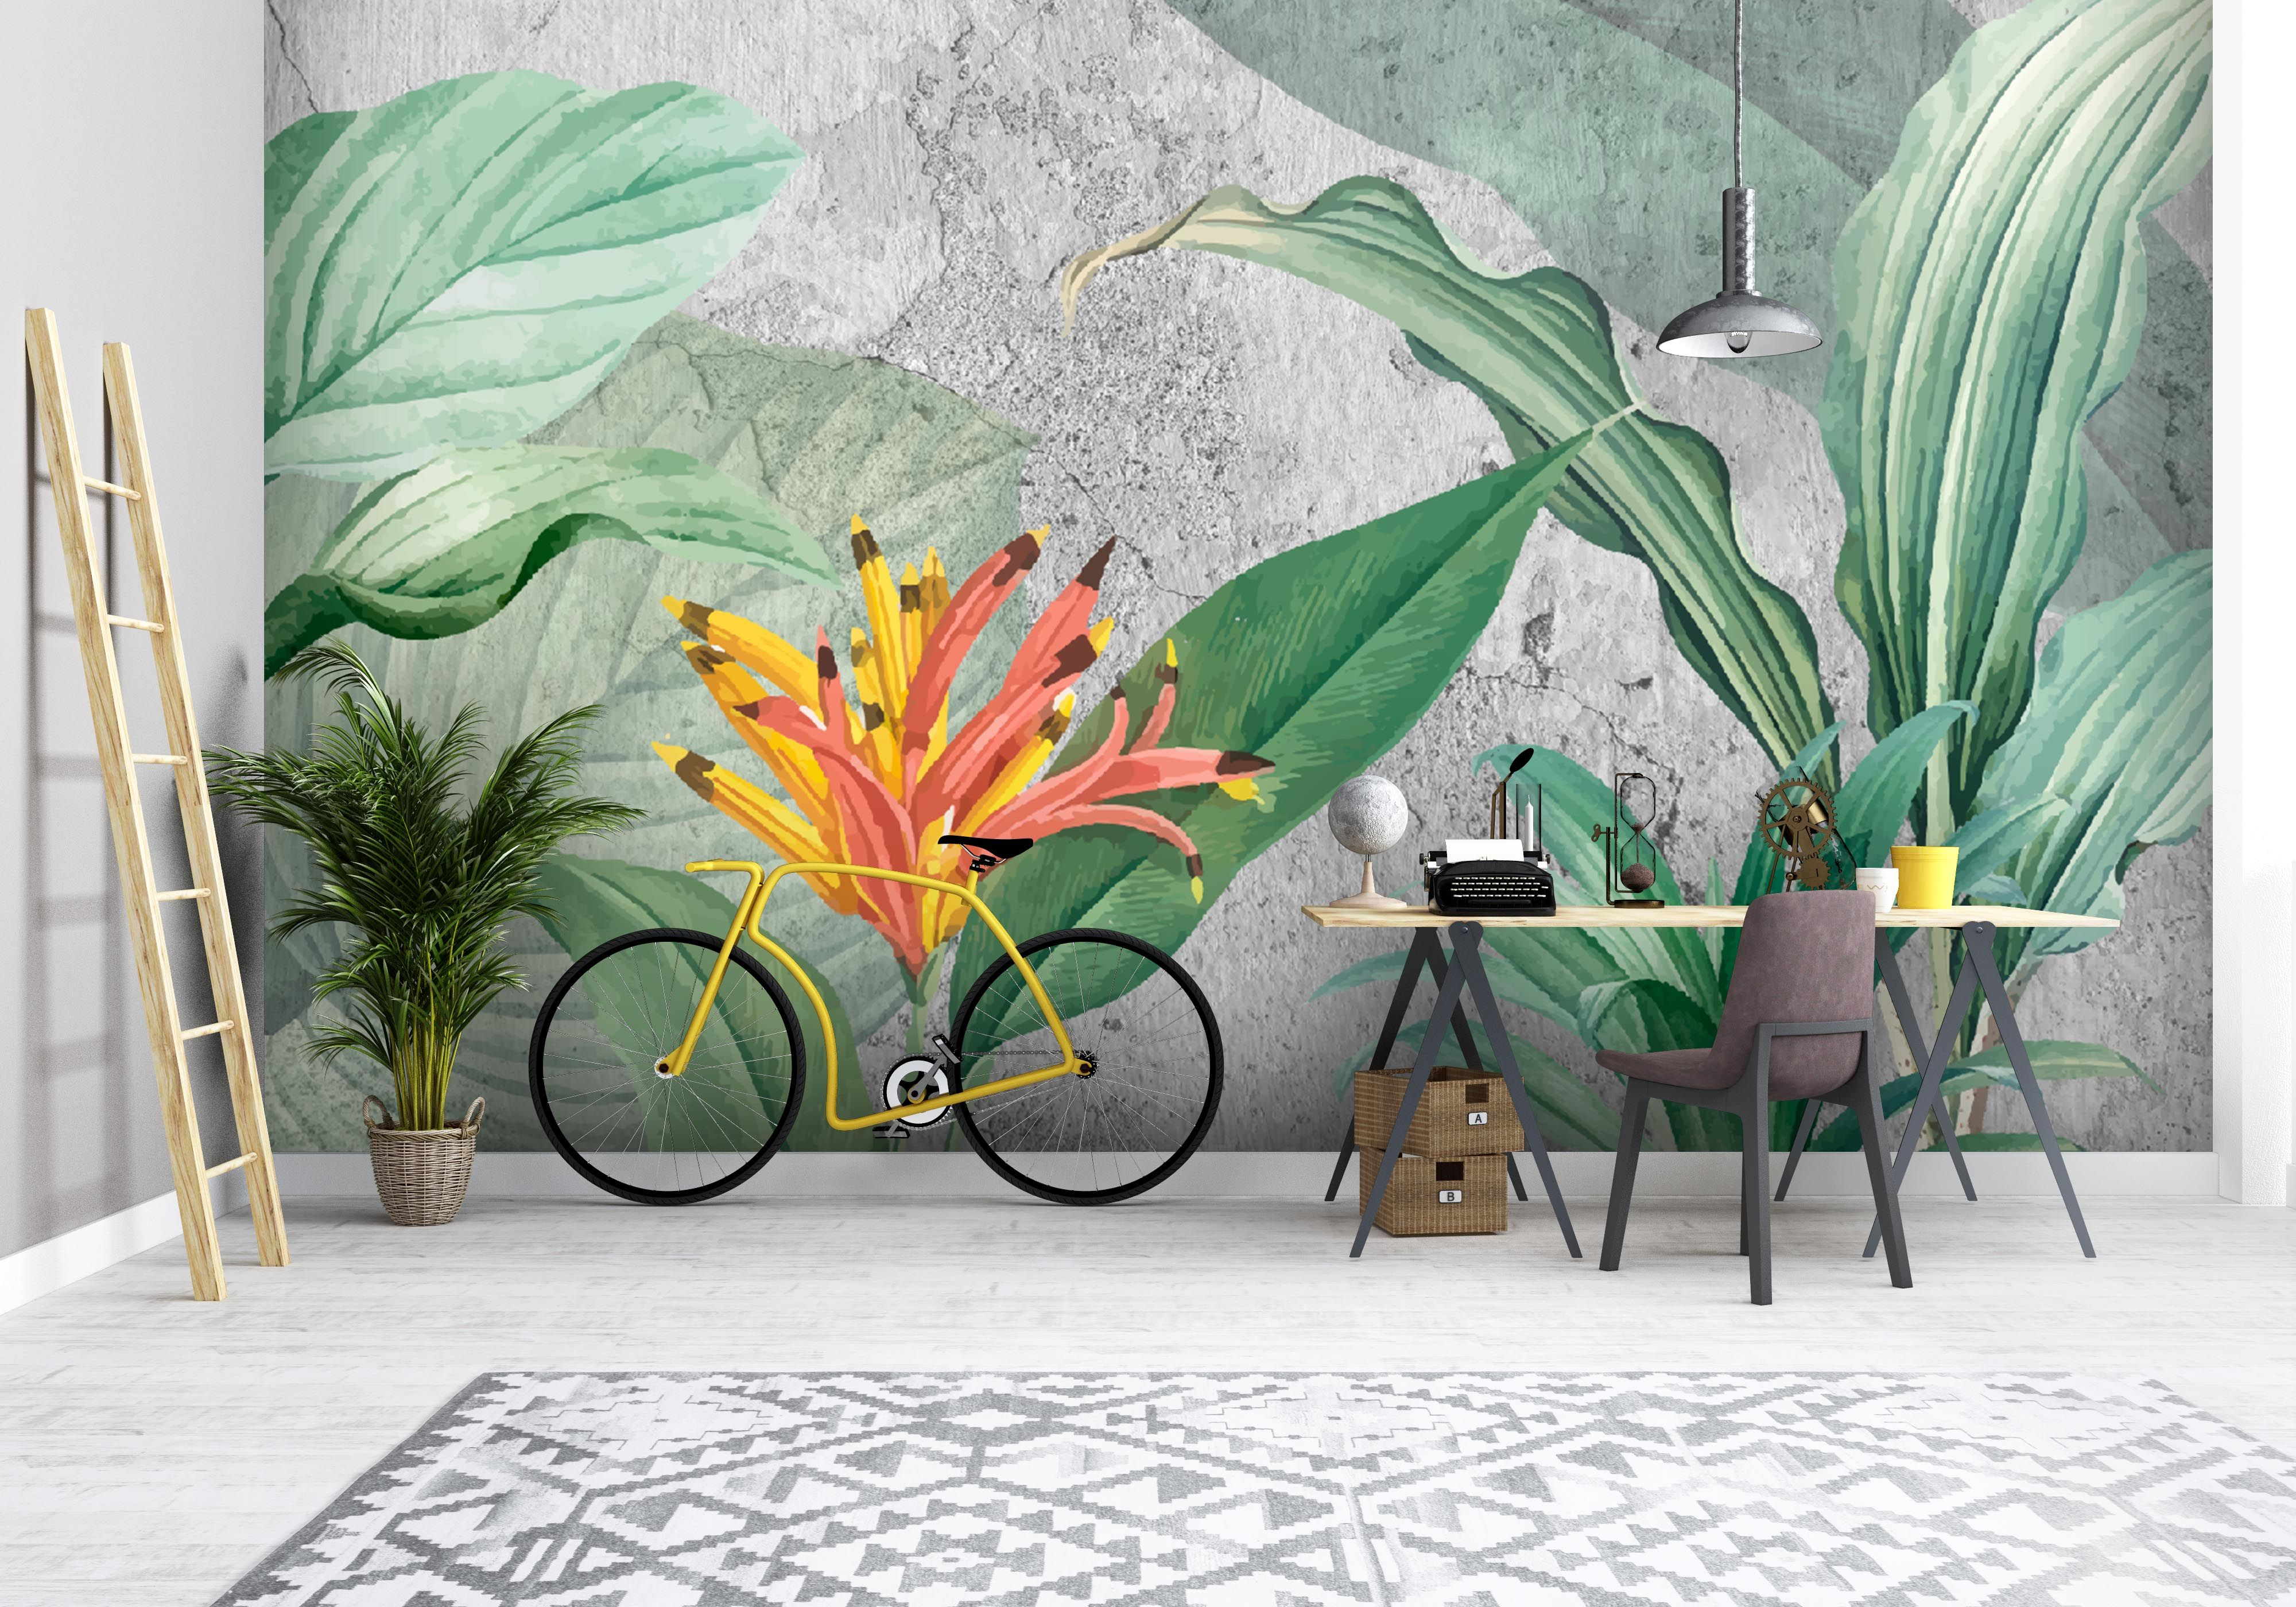 Concrete Leaves Wallpaper Mural Mural Mural Design Removable Wall Murals